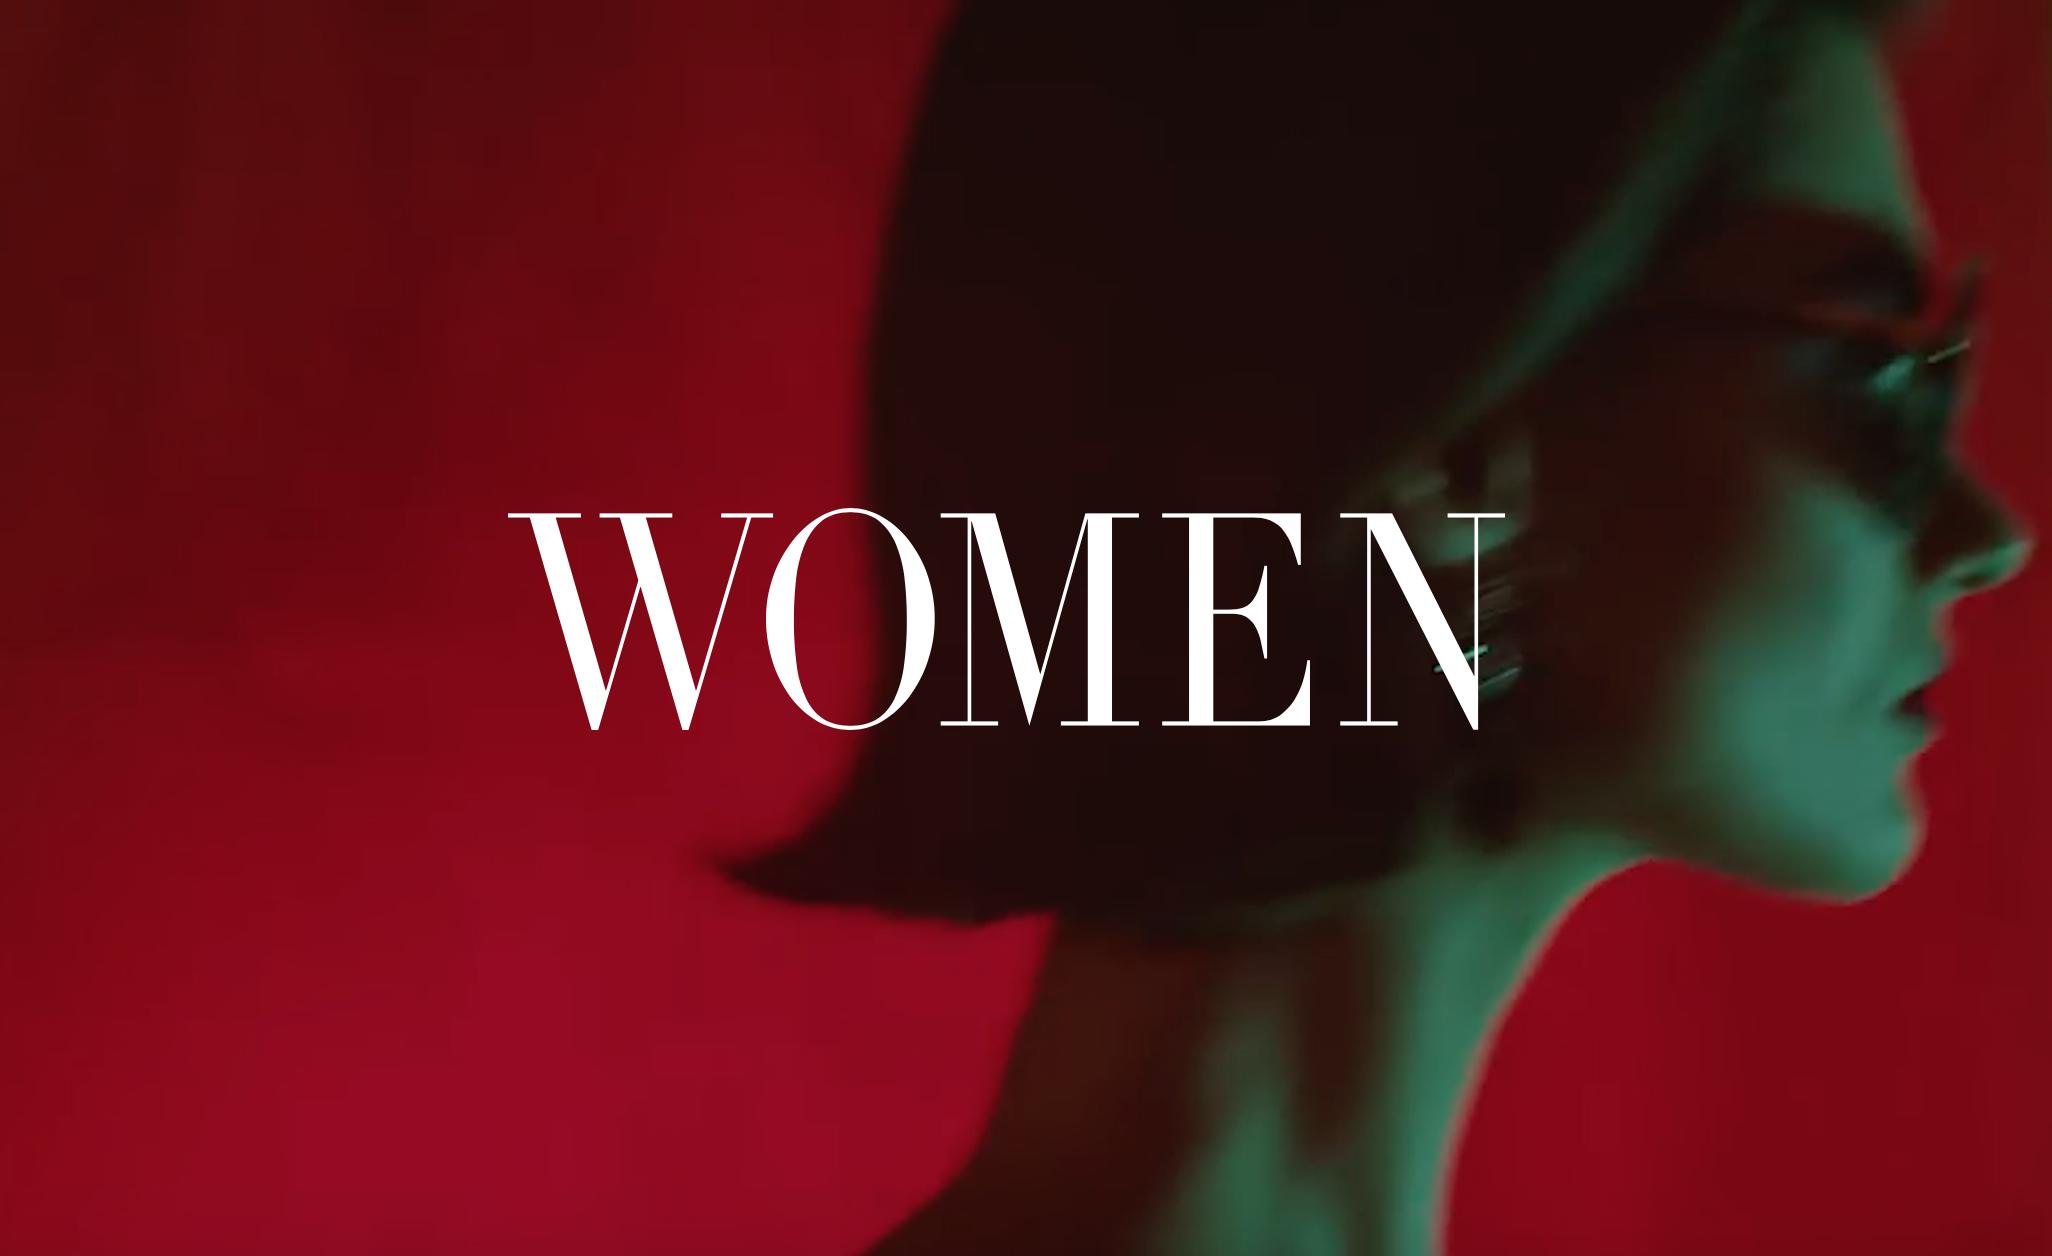 image: Women